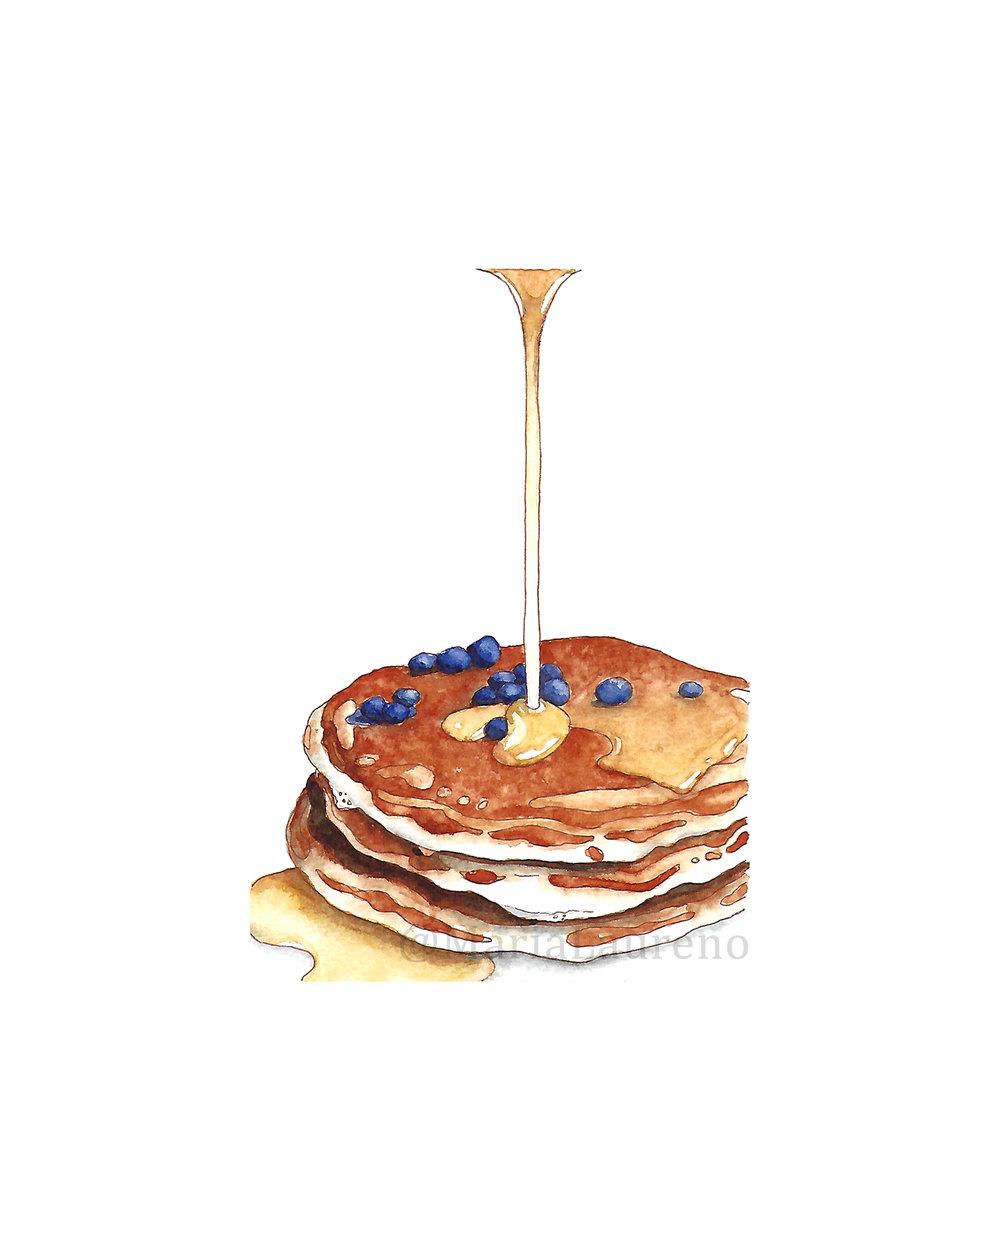 pancakes 8x10.jpg